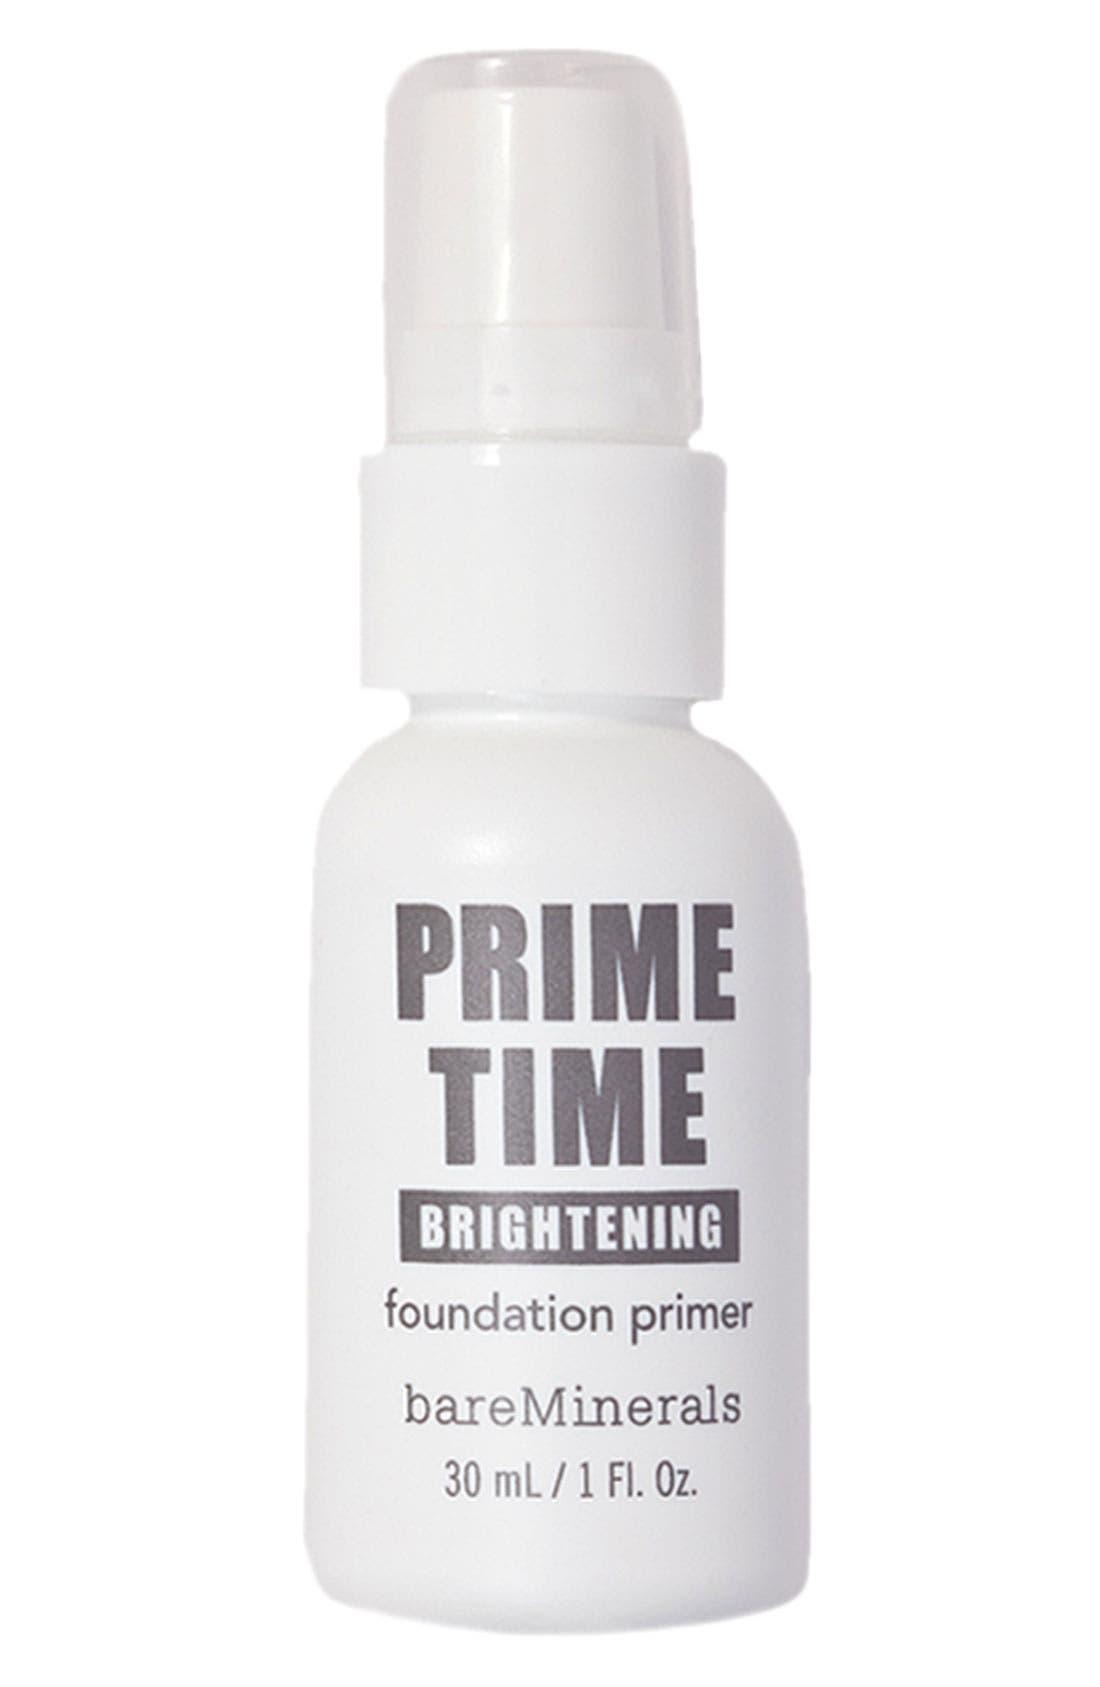 'Prime Time' Brightening Foundation Primer,                         Main,                         color, 000